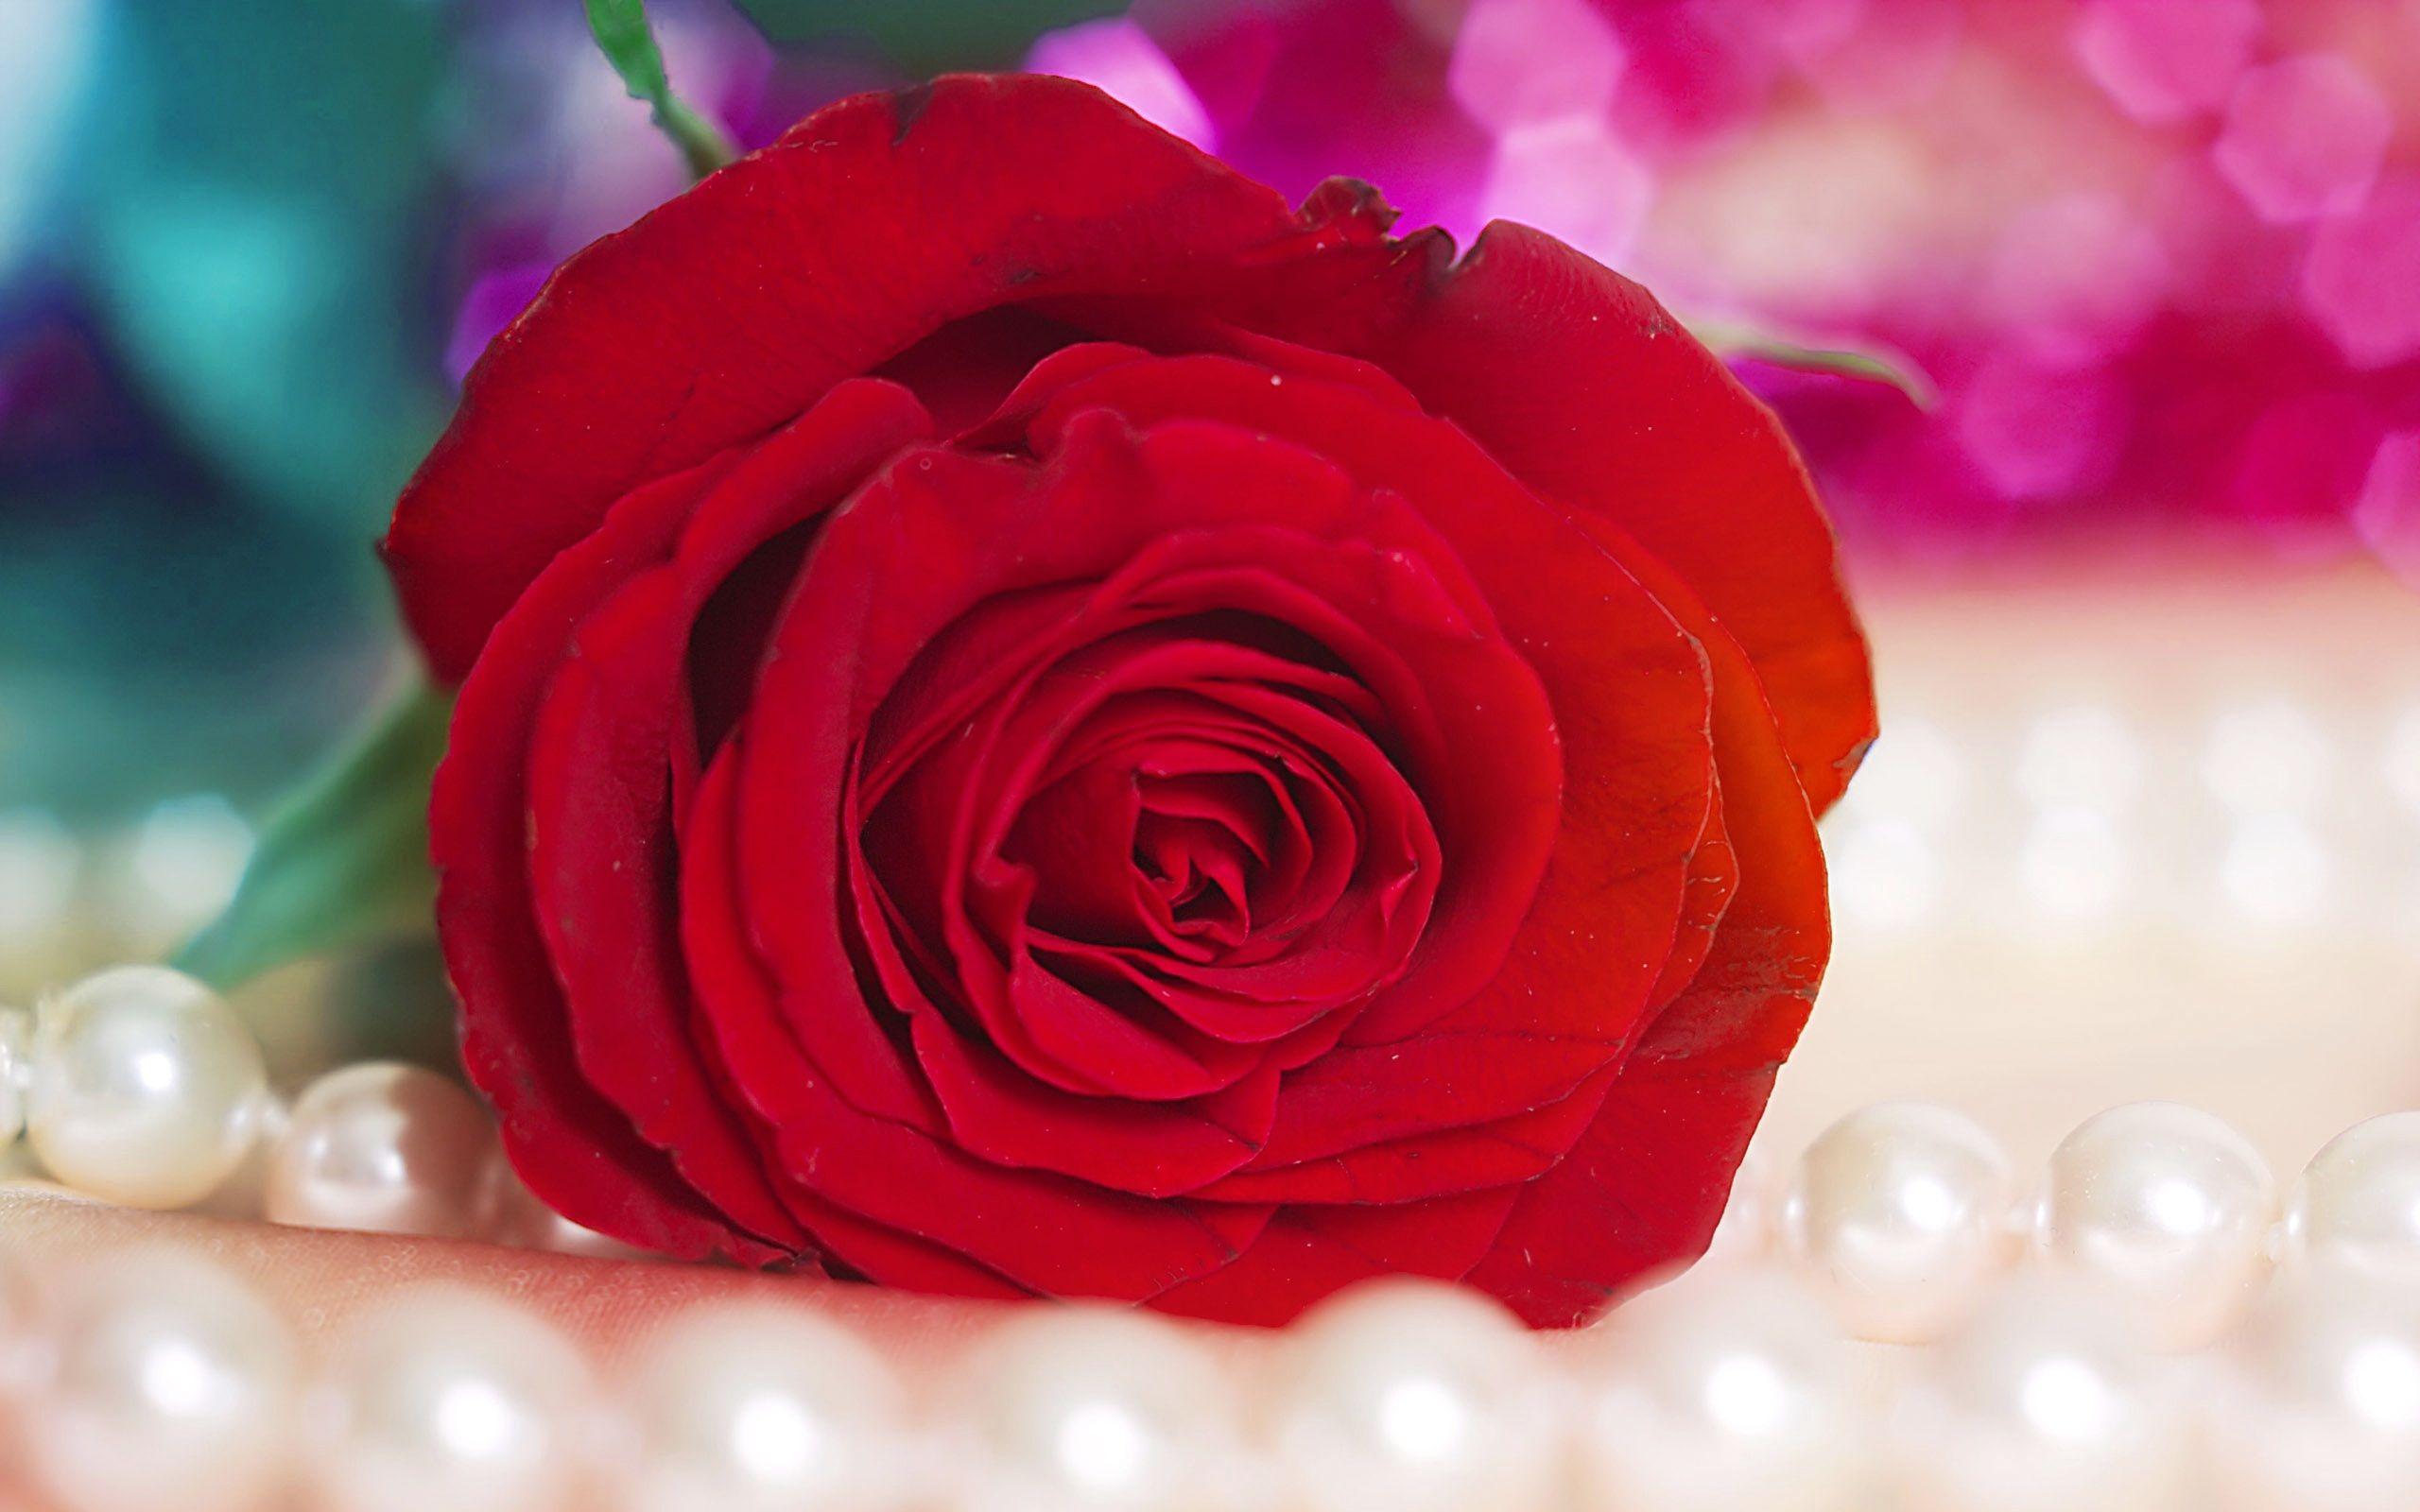 Permalink to Red Rose Flower Hd Wallpaper